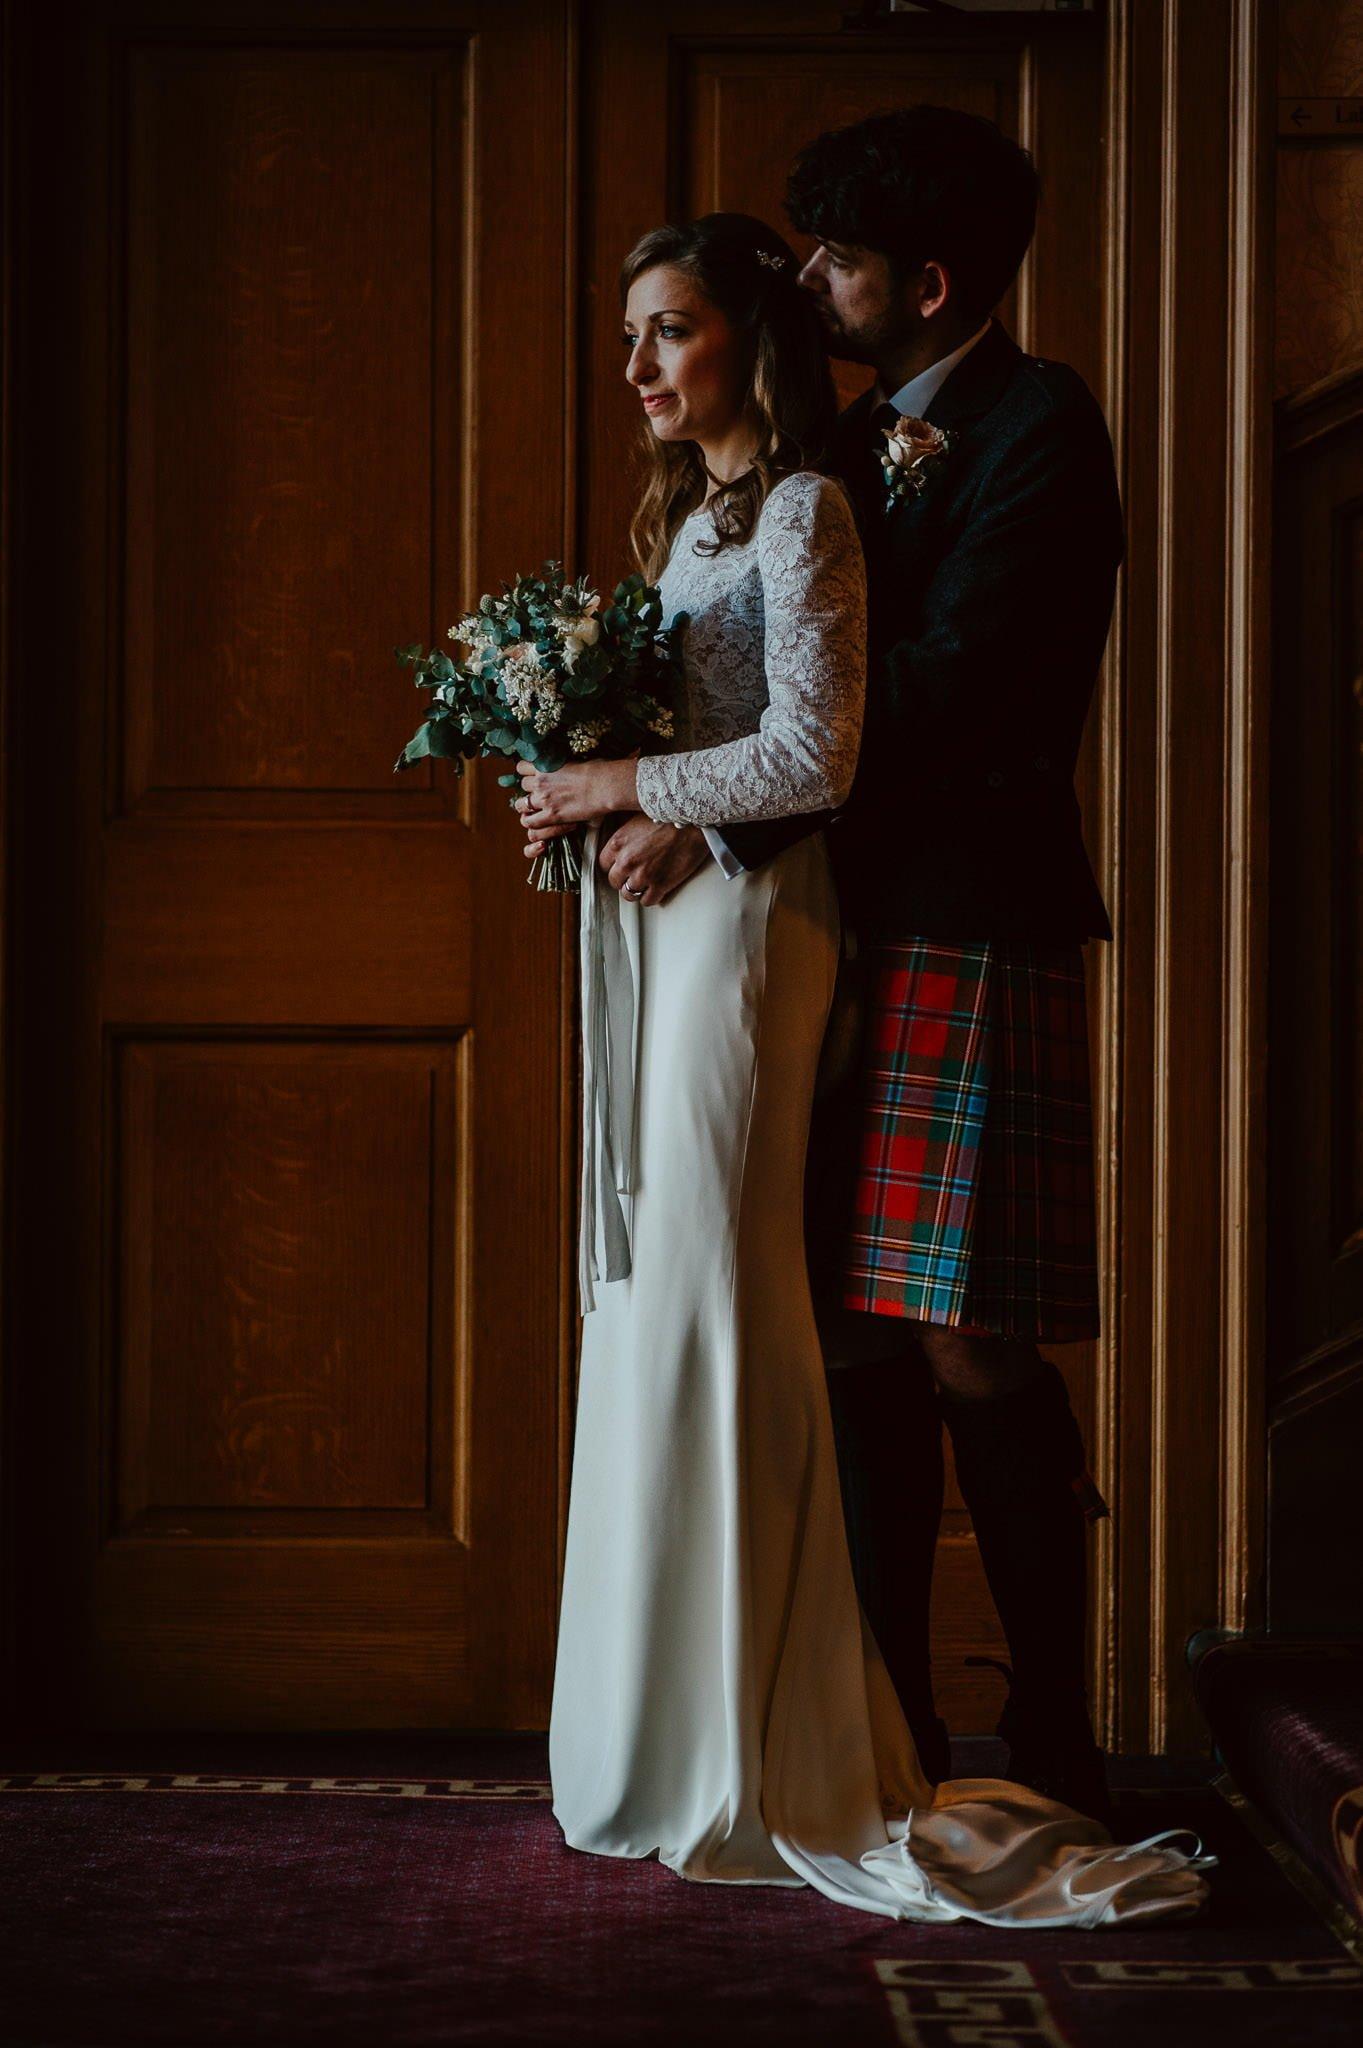 A Charming Edinburgh City Chambers Wedding 21